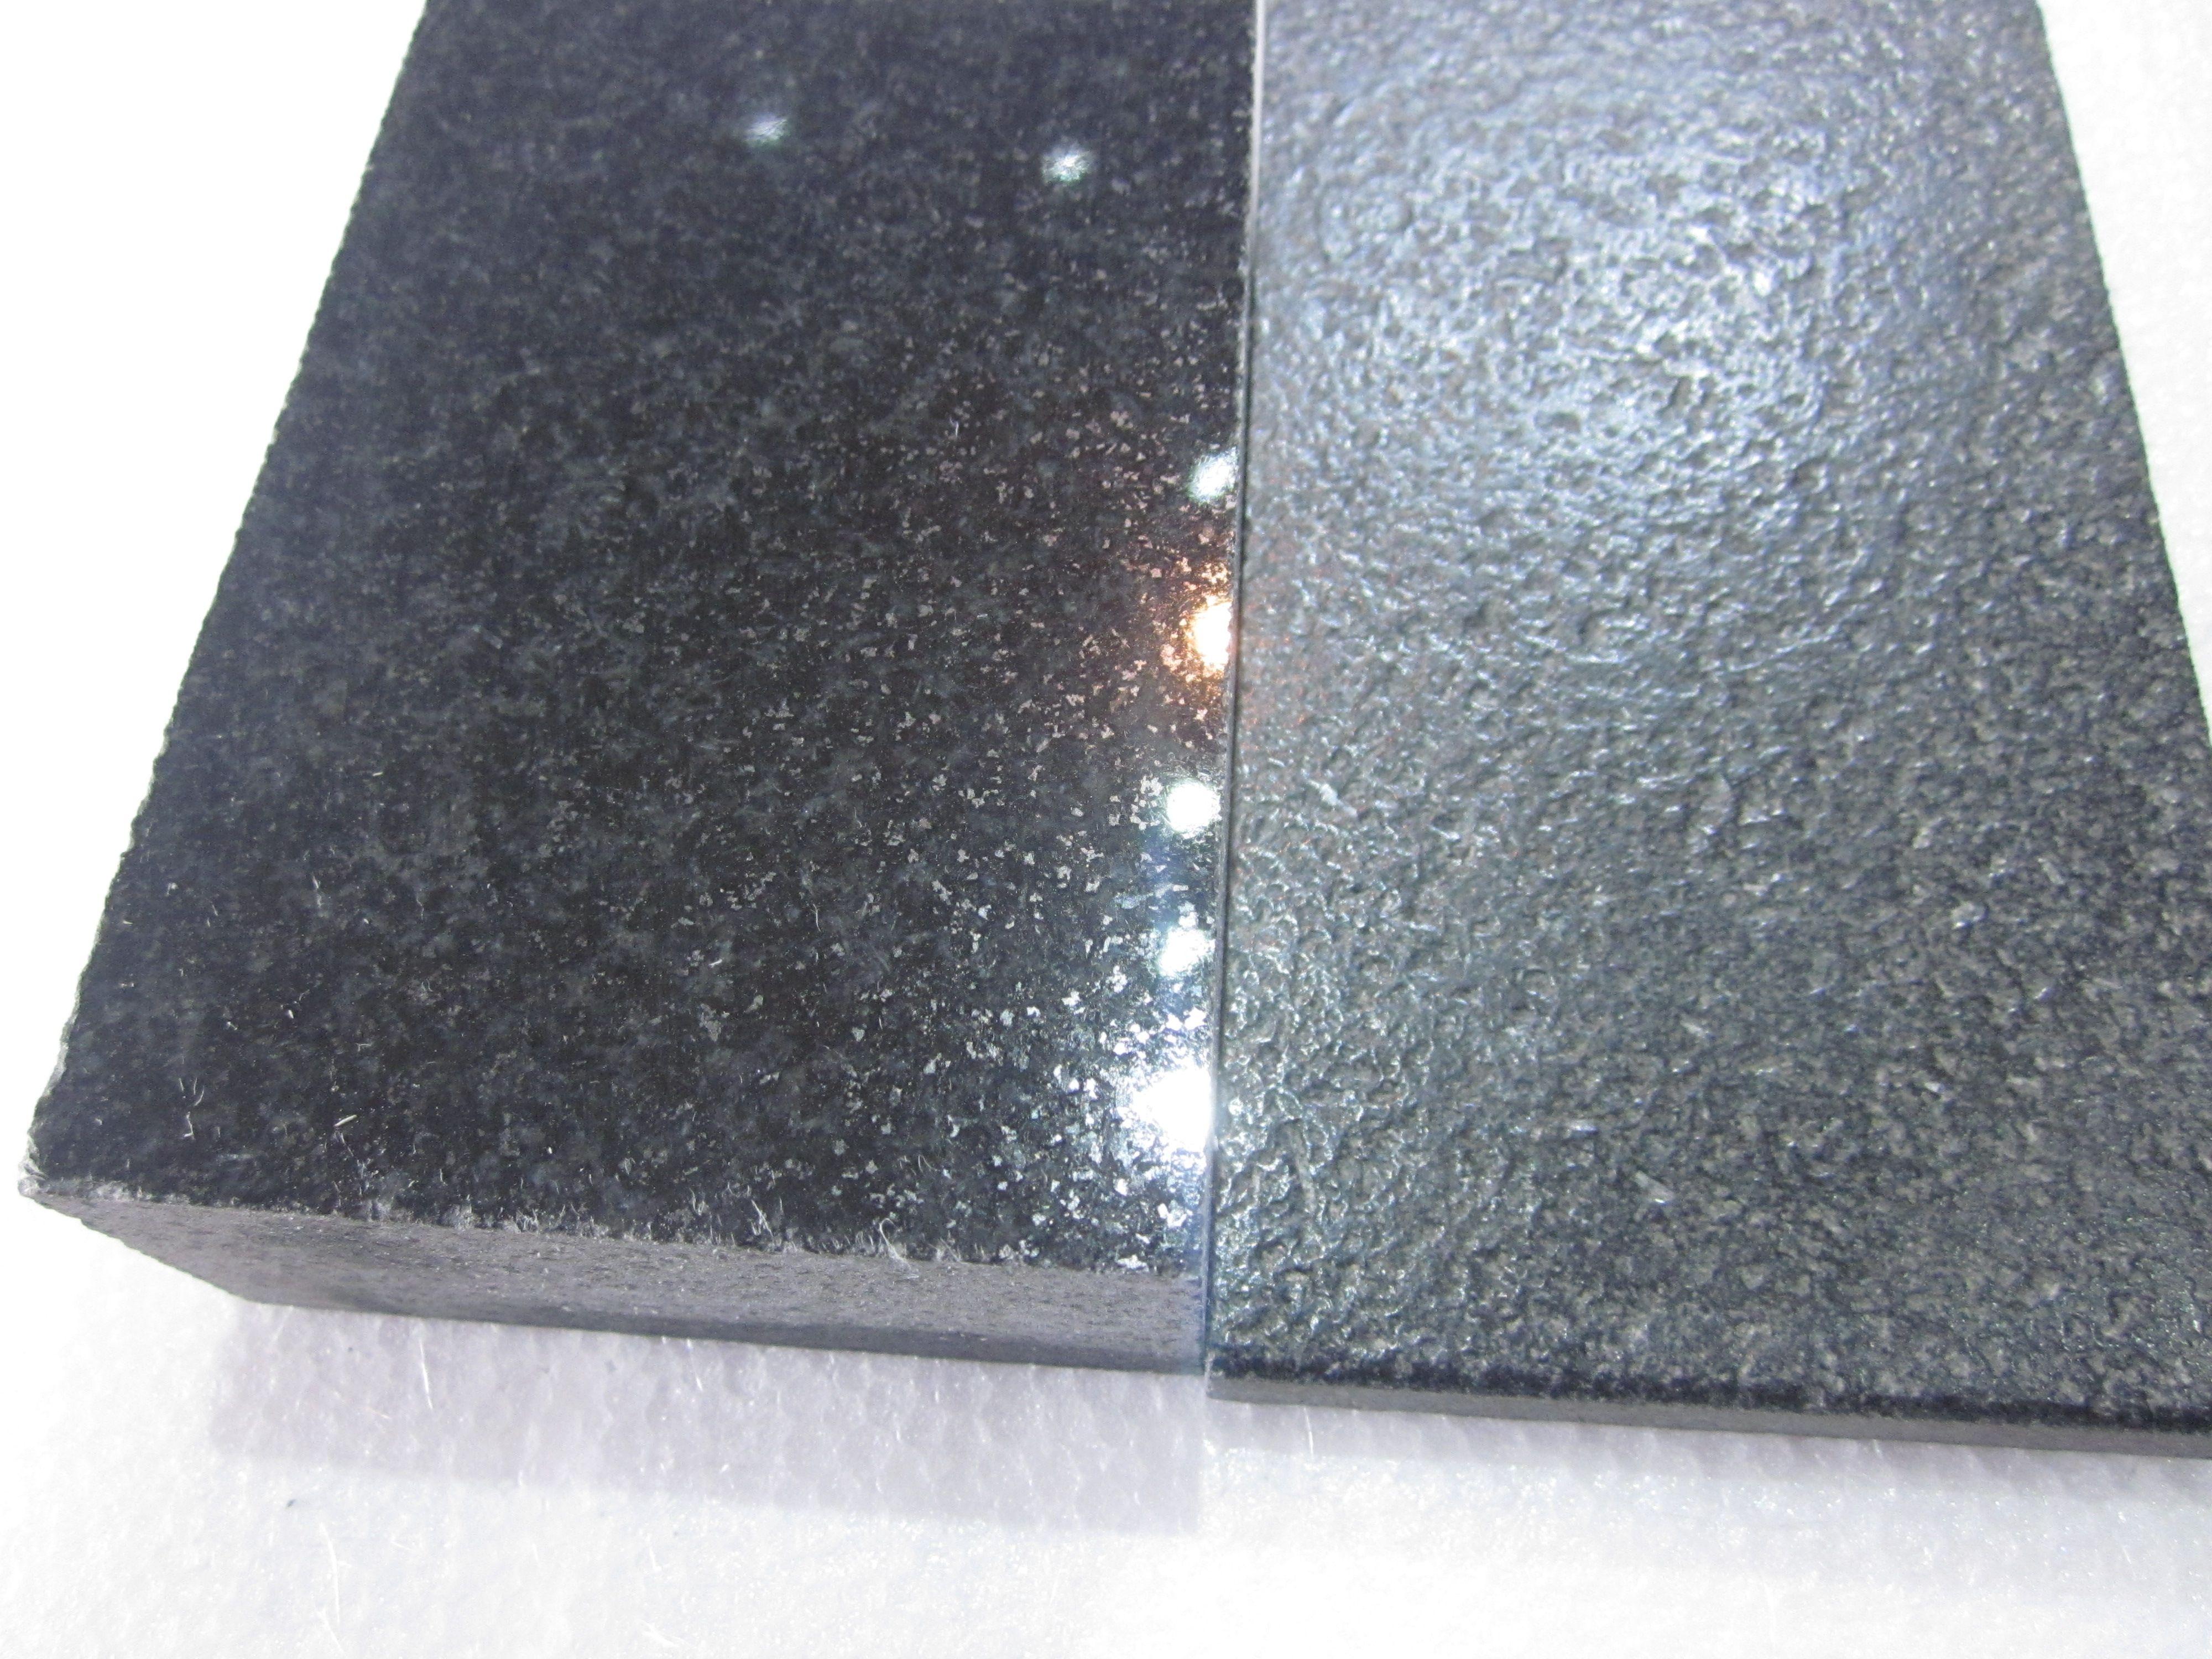 Black Leather Granite : Black leathered granite countertops google search